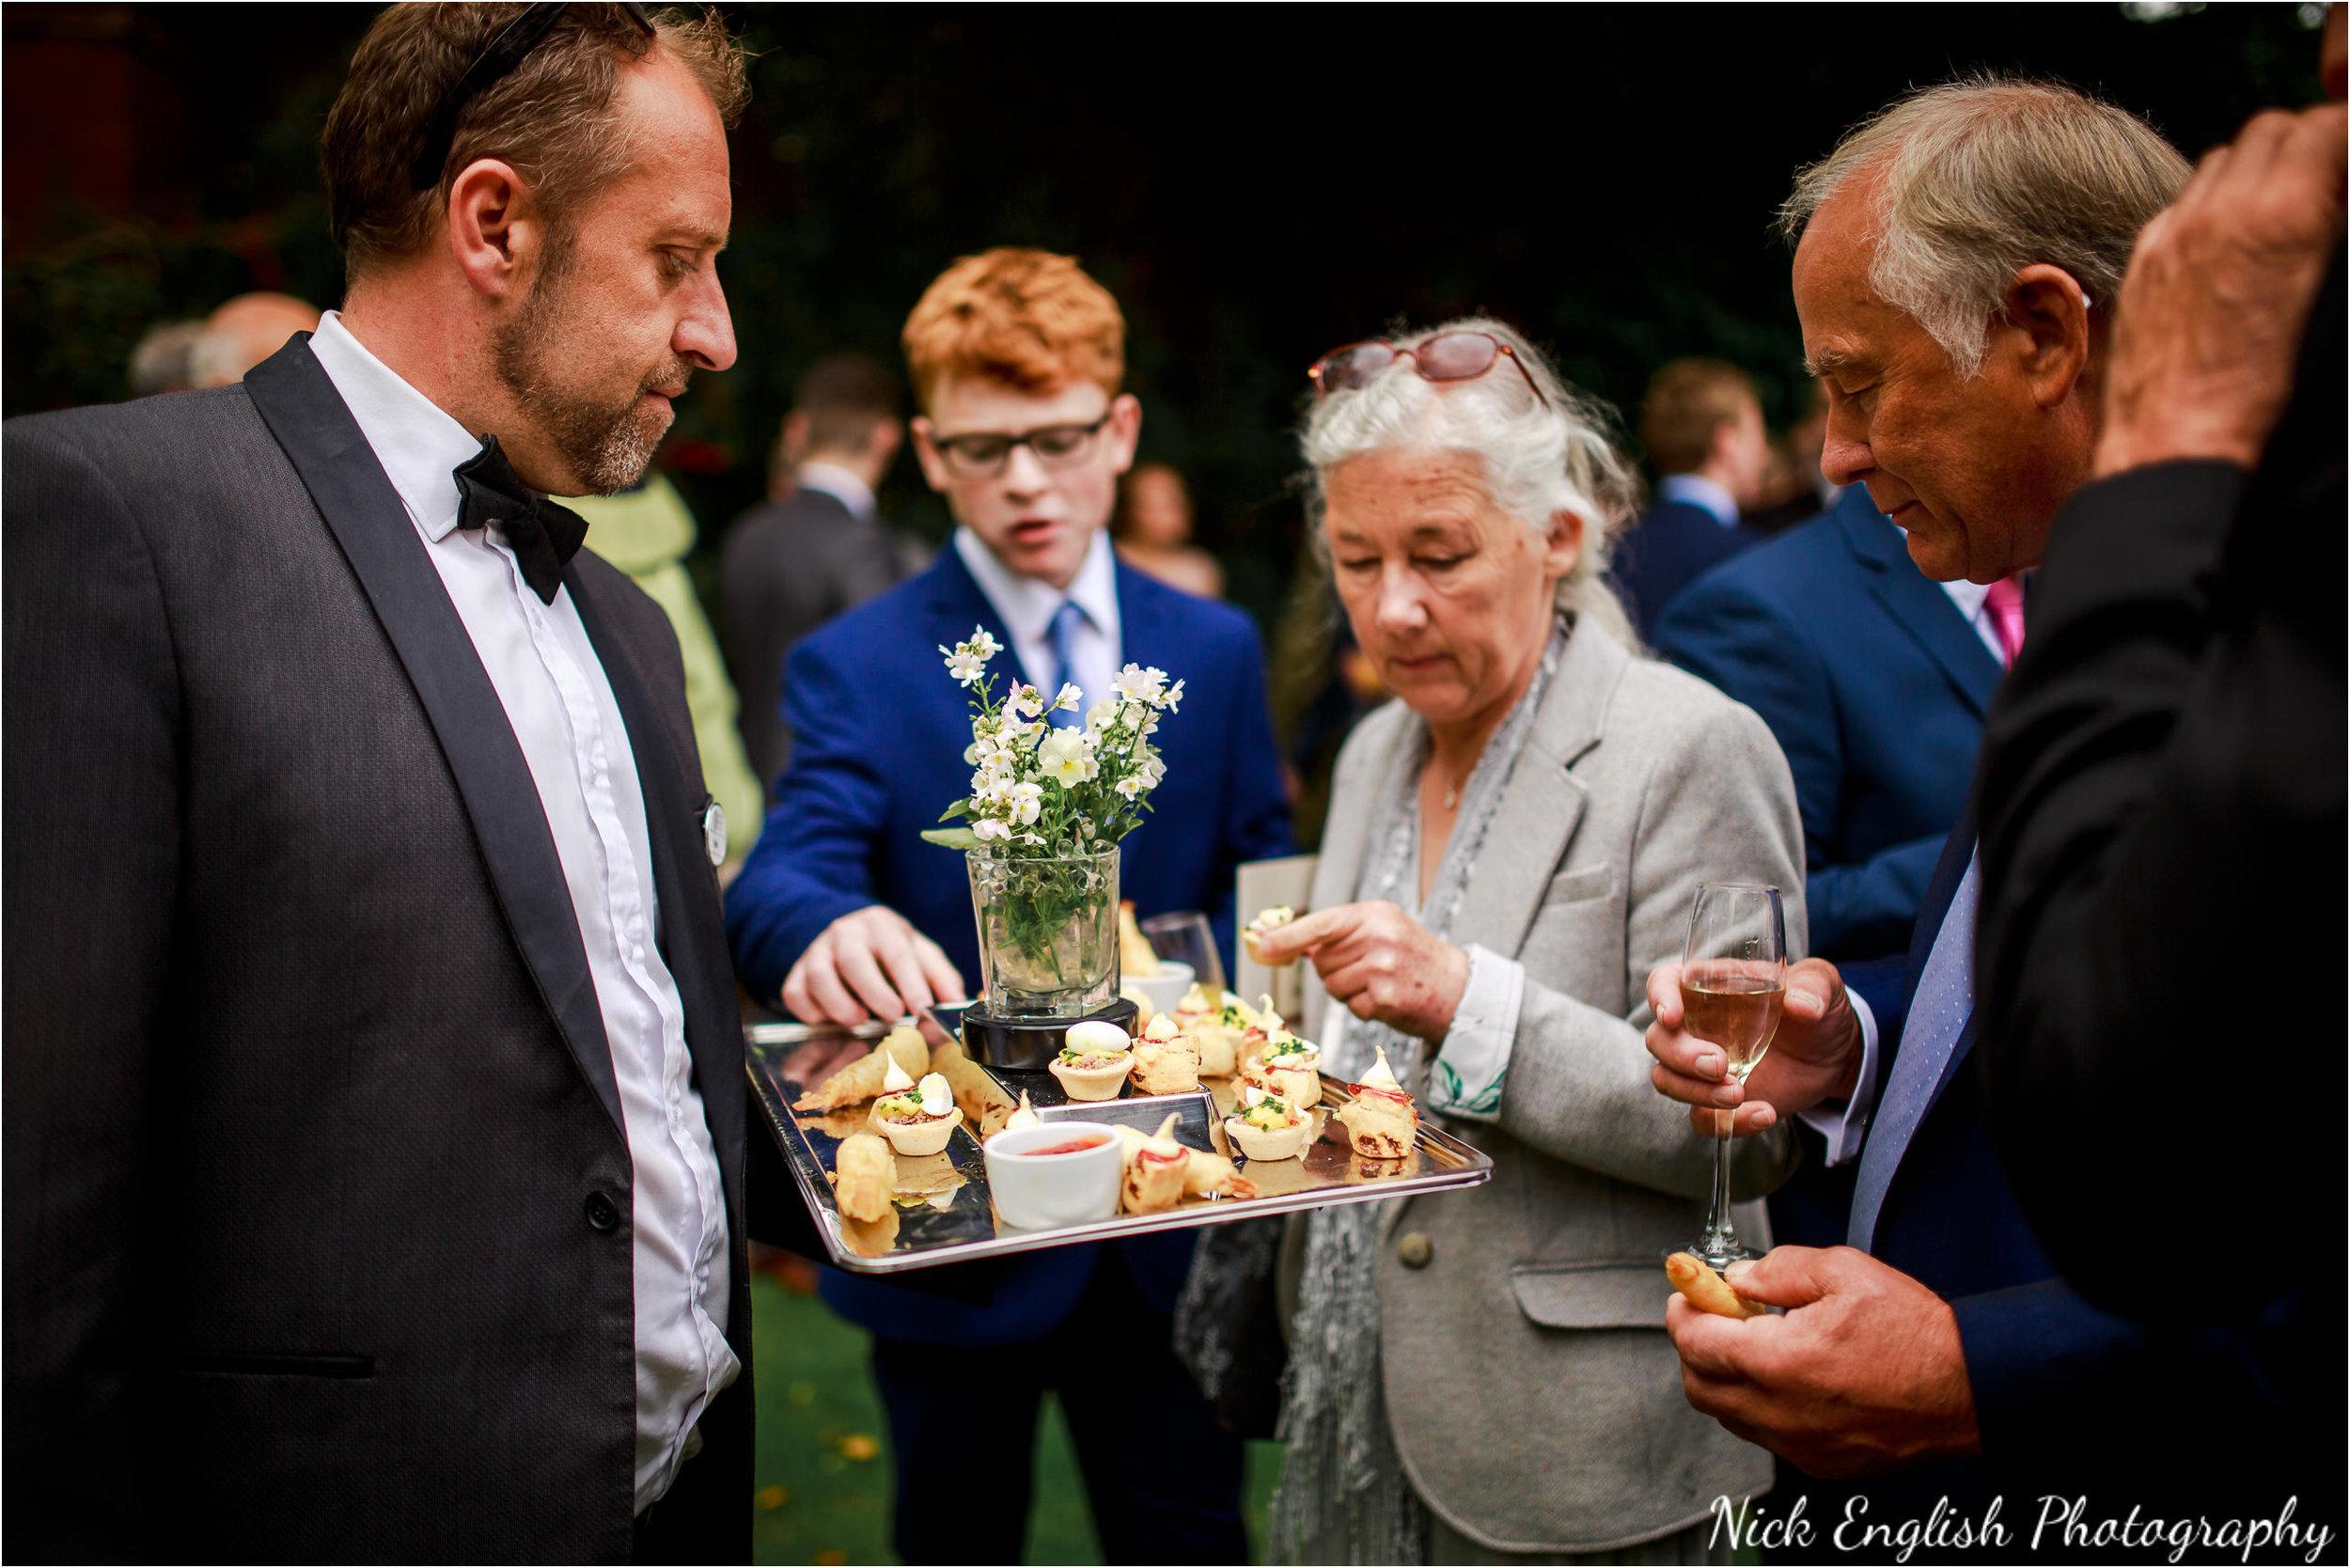 Emily David Wedding Photographs at Barton Grange Preston by Nick English Photography 110jpg.jpeg